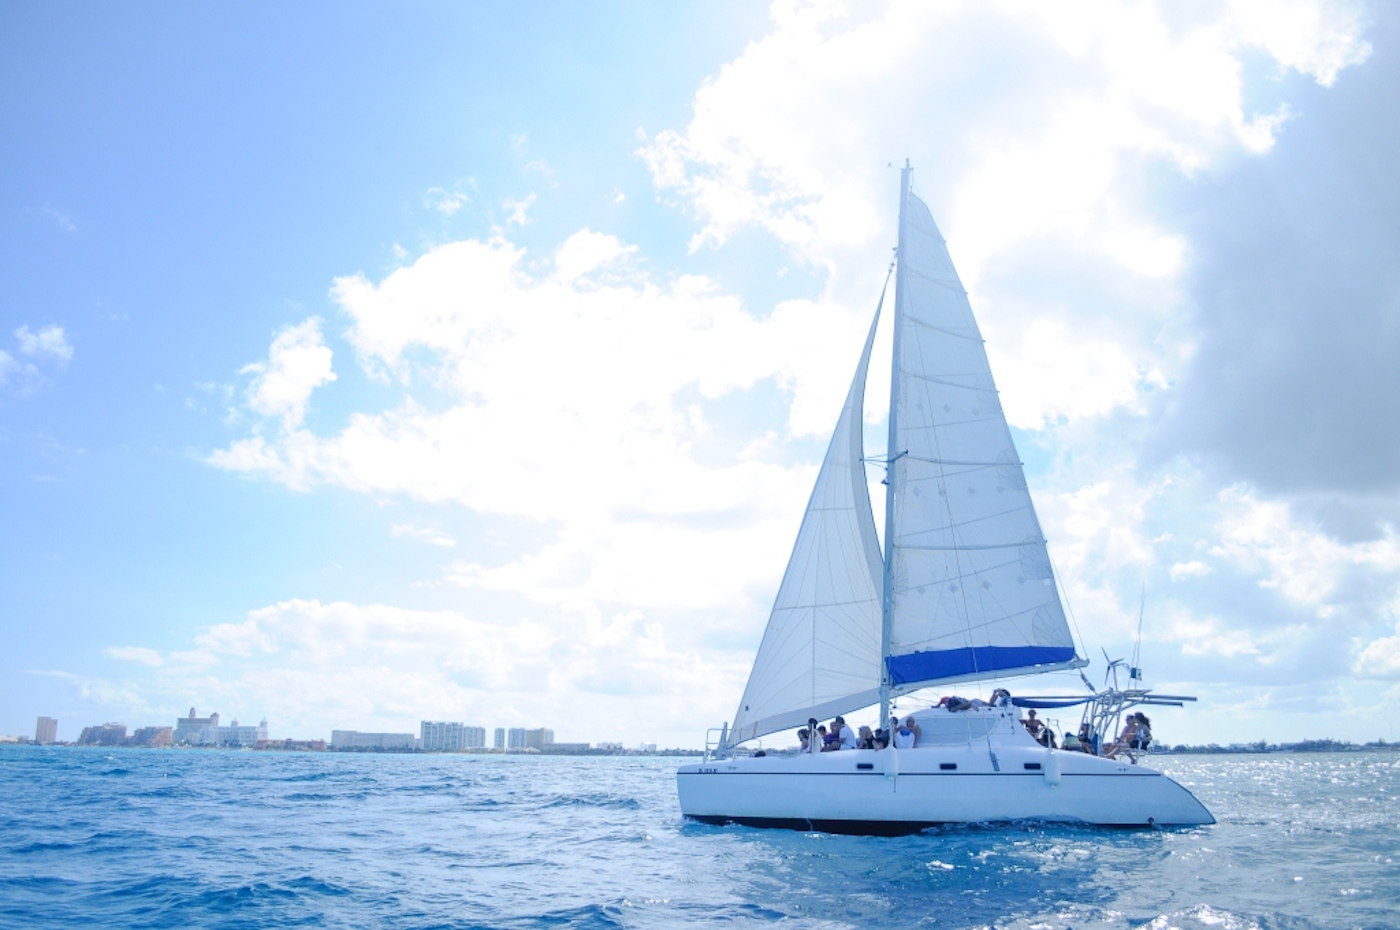 Catamaran-Snorkel-Trips-Cancun-Isla-Mujeres-12